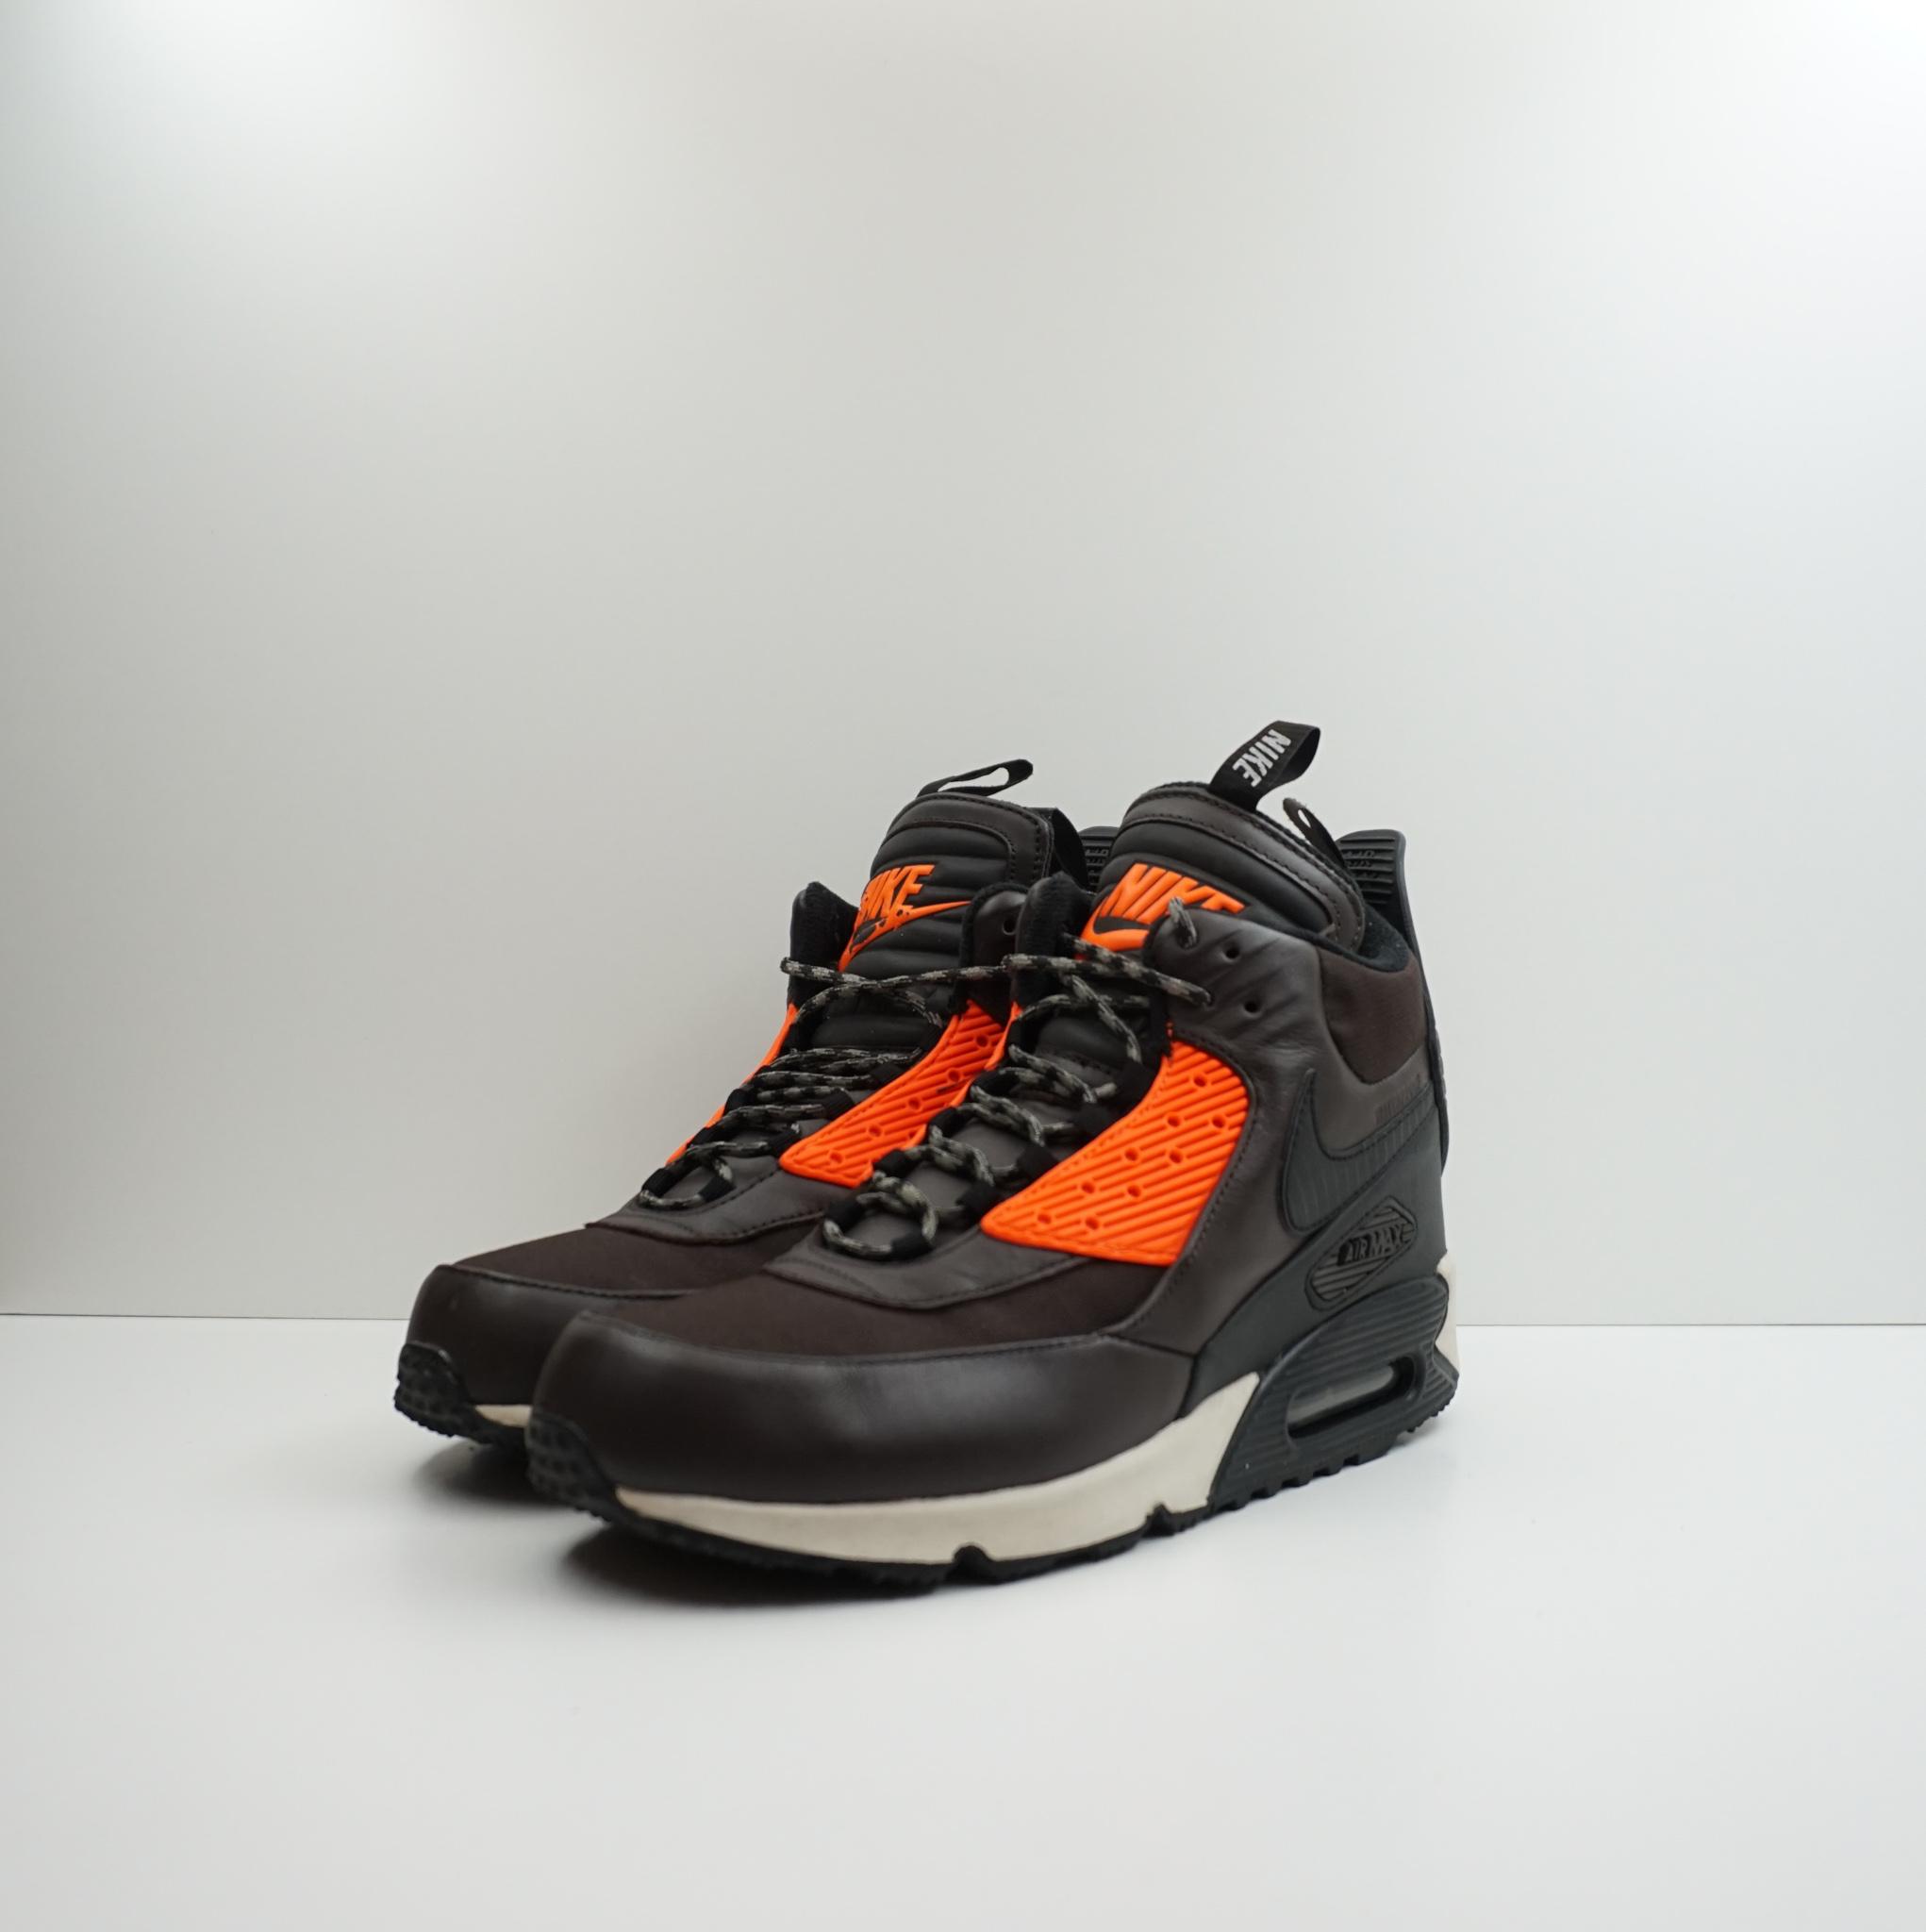 Nike Air Max 90 Winter Boot Velvet Brown